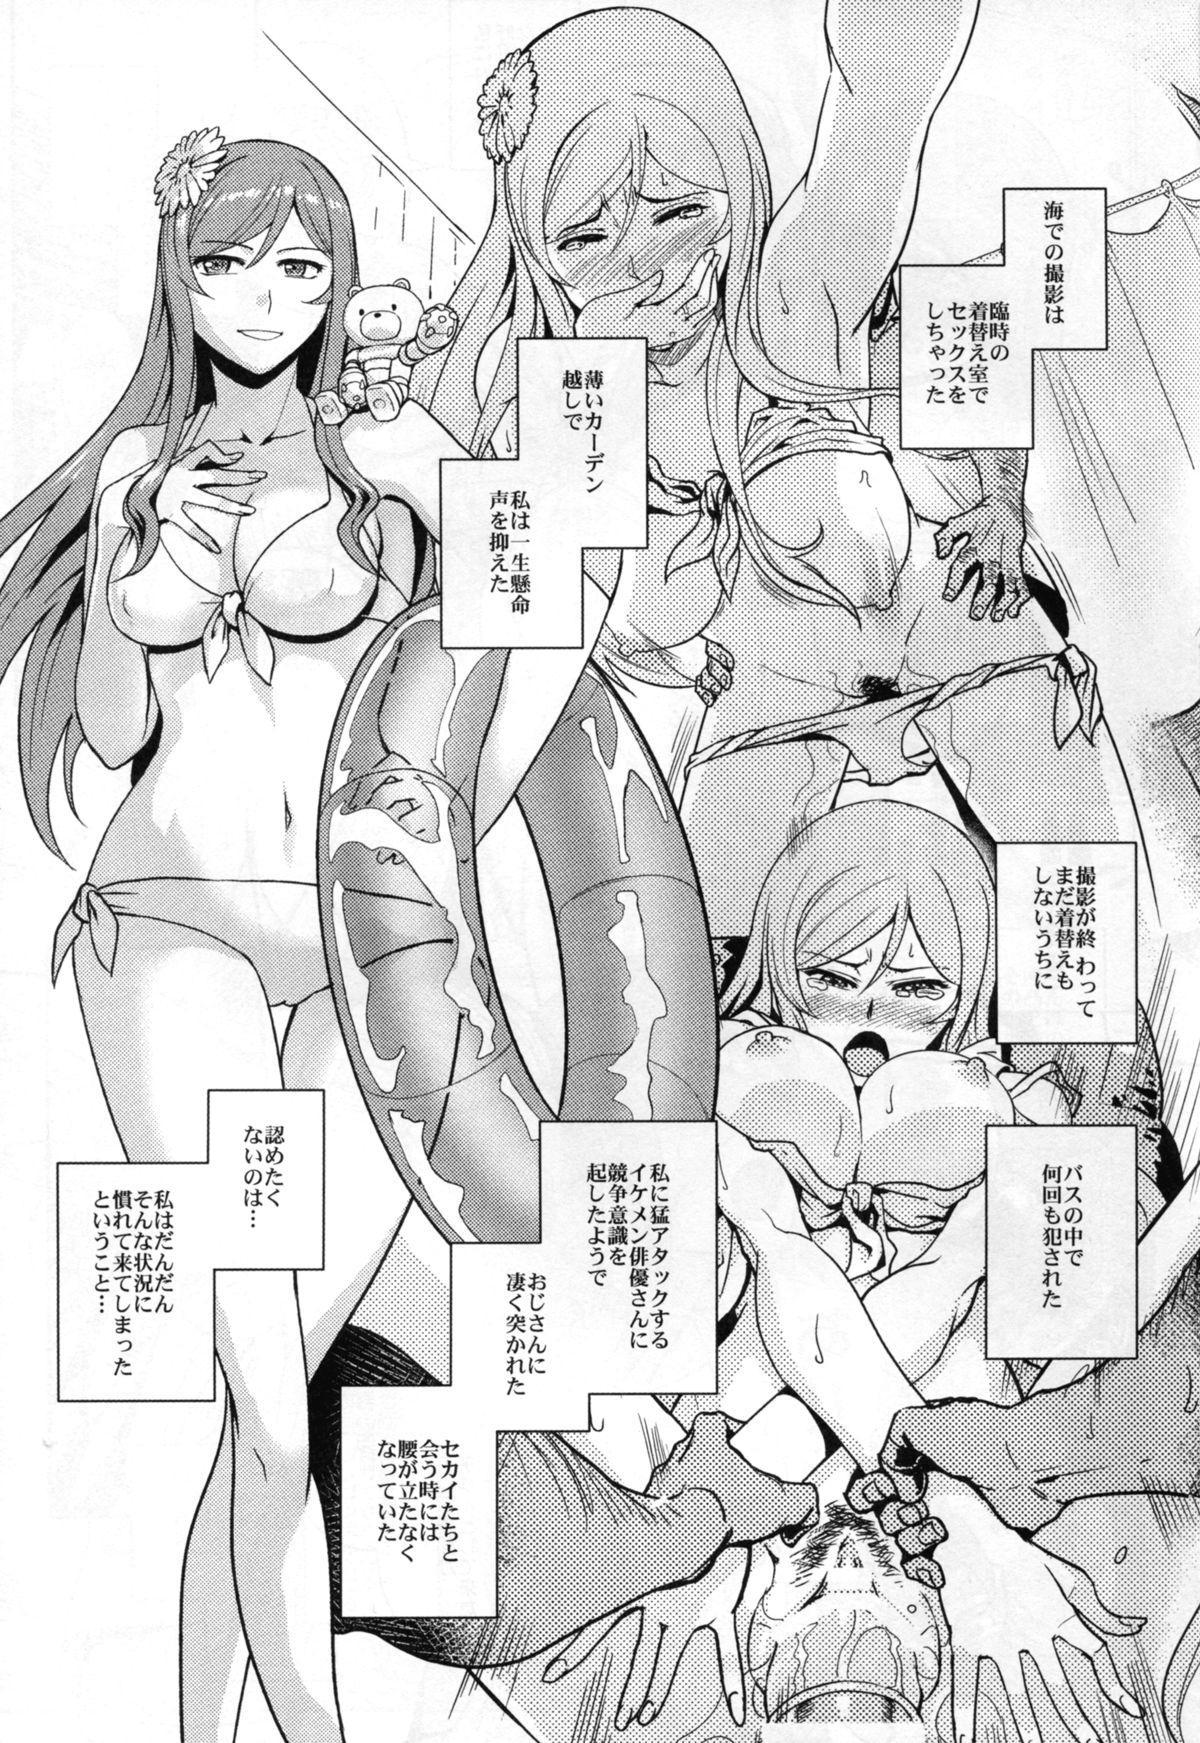 Gunpla Battle Image Character TRY!!! 18